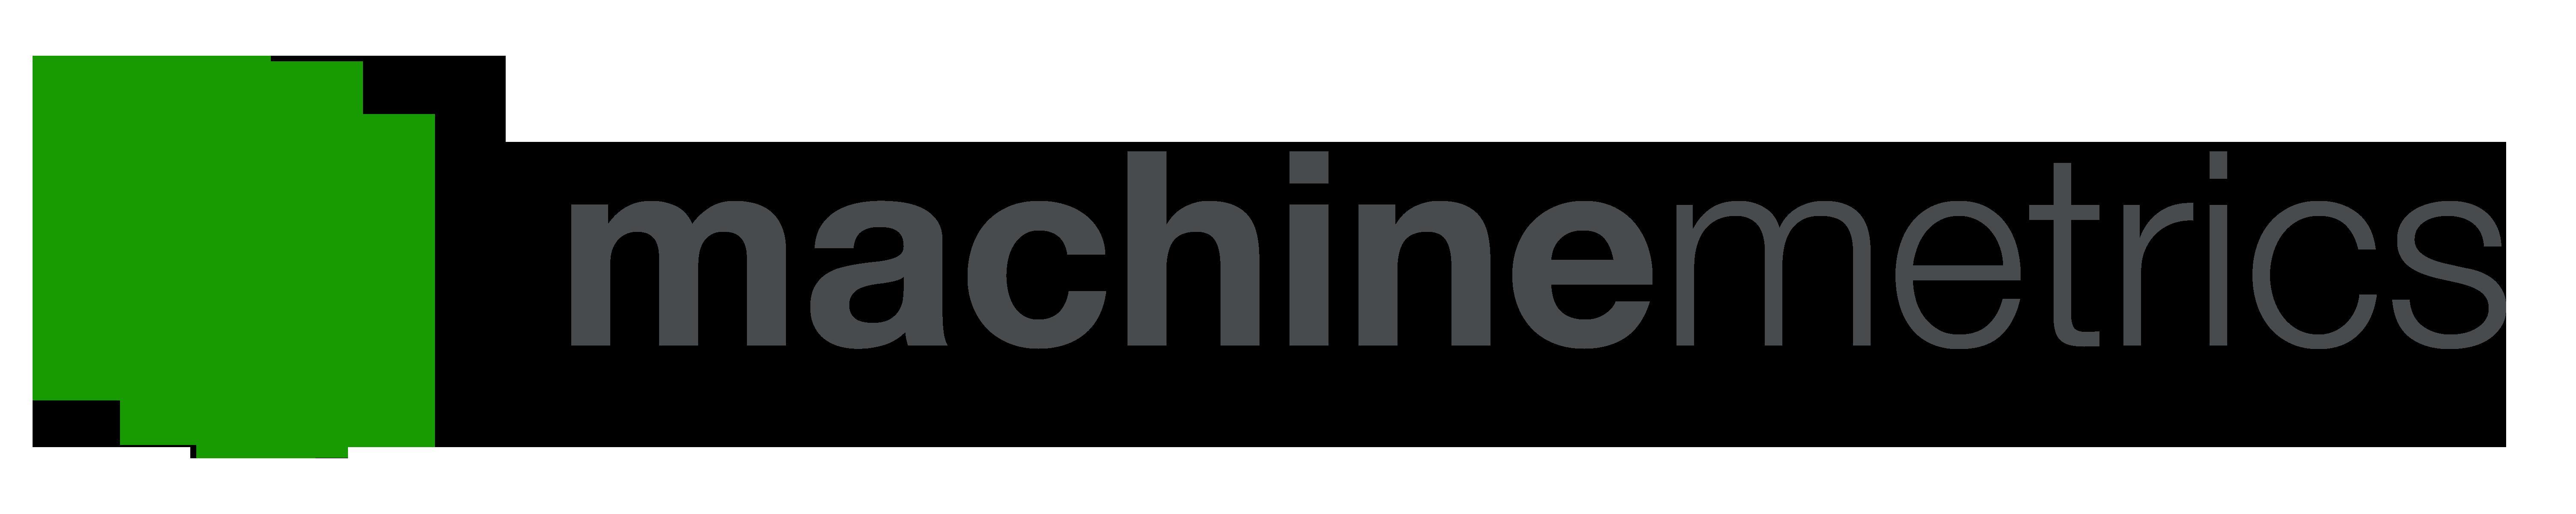 Standard-Logo